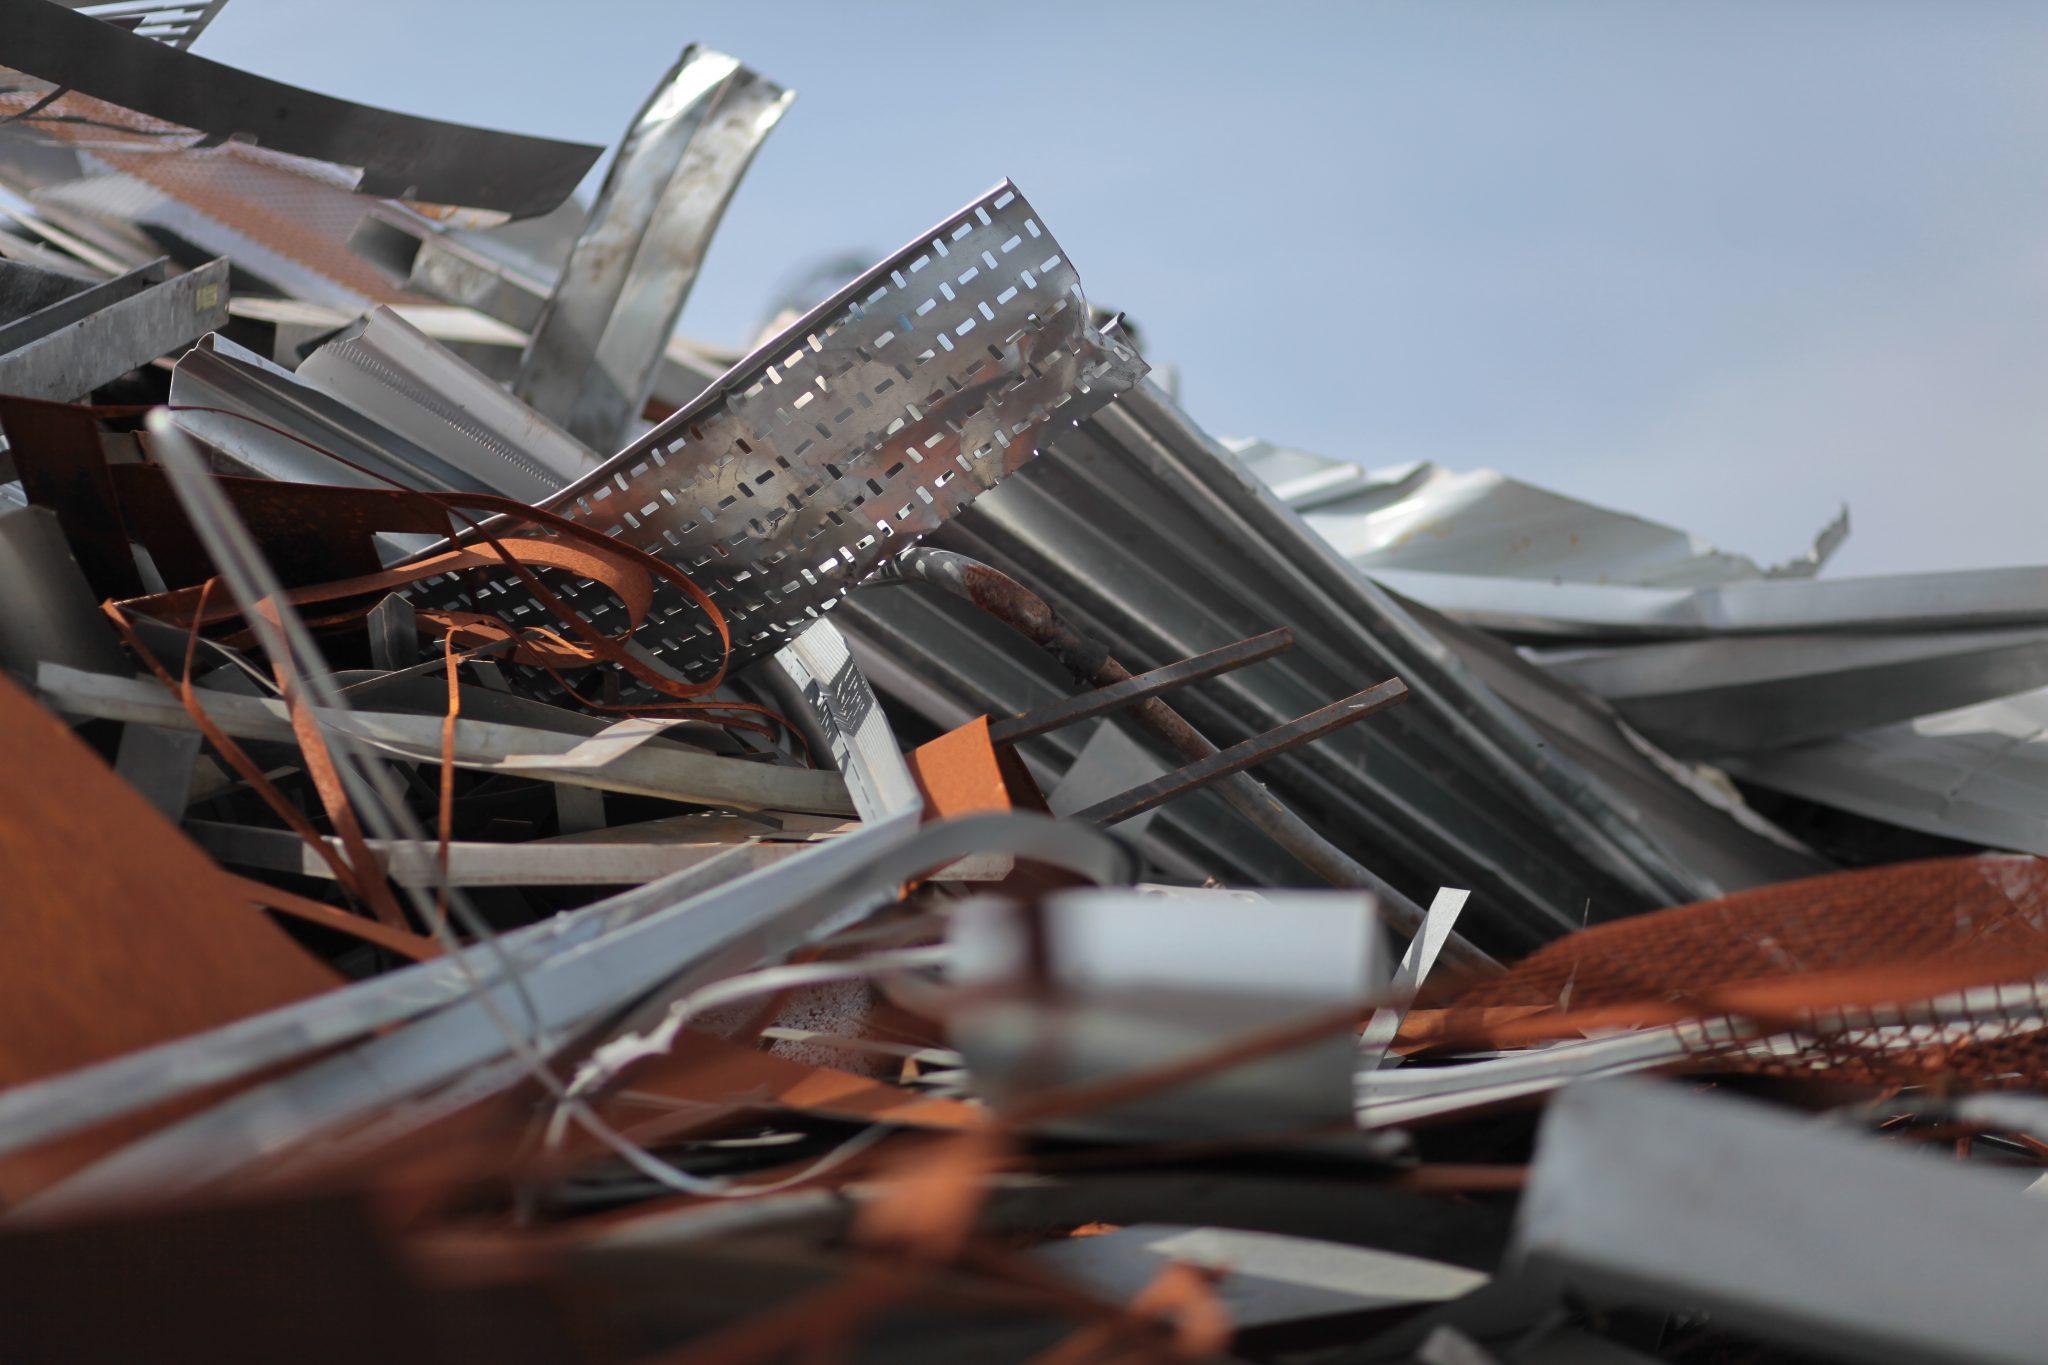 Scrap Metal Clearance in Ellesmere Port